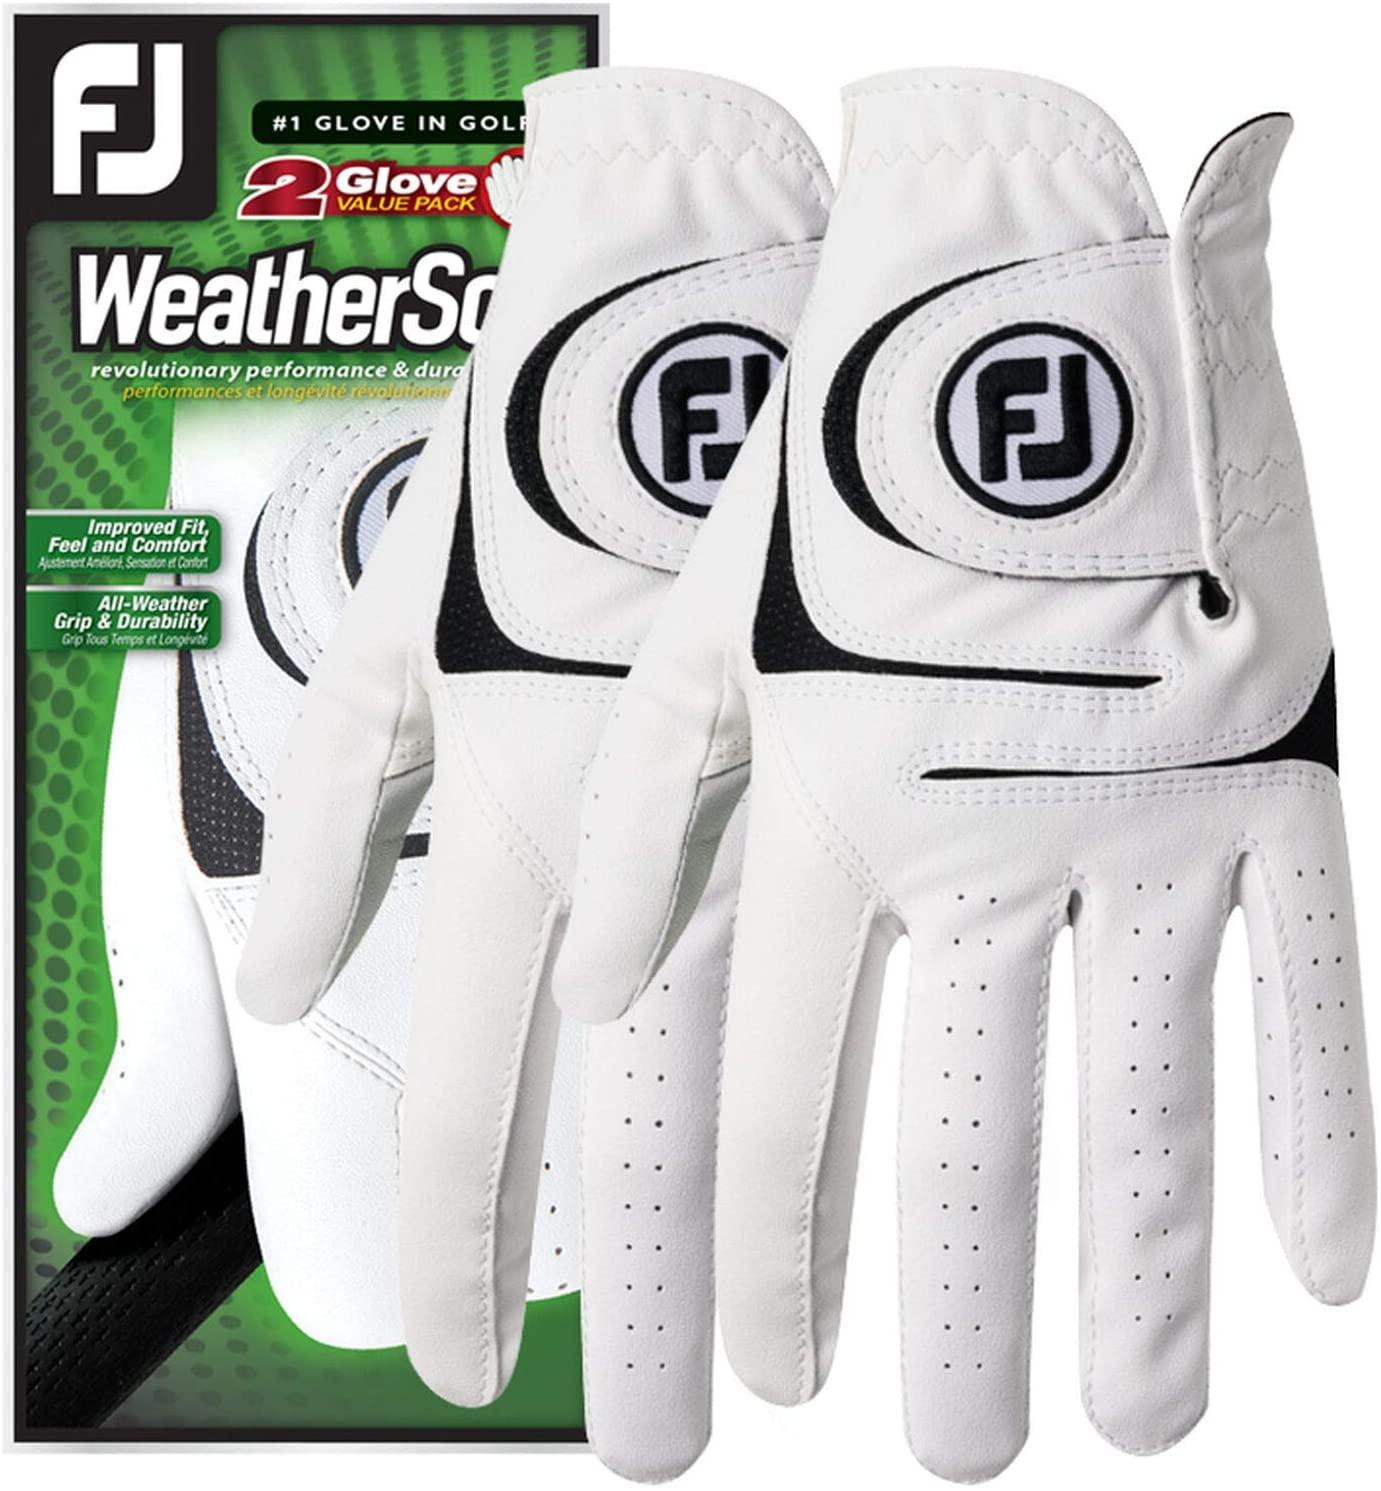 top gloves